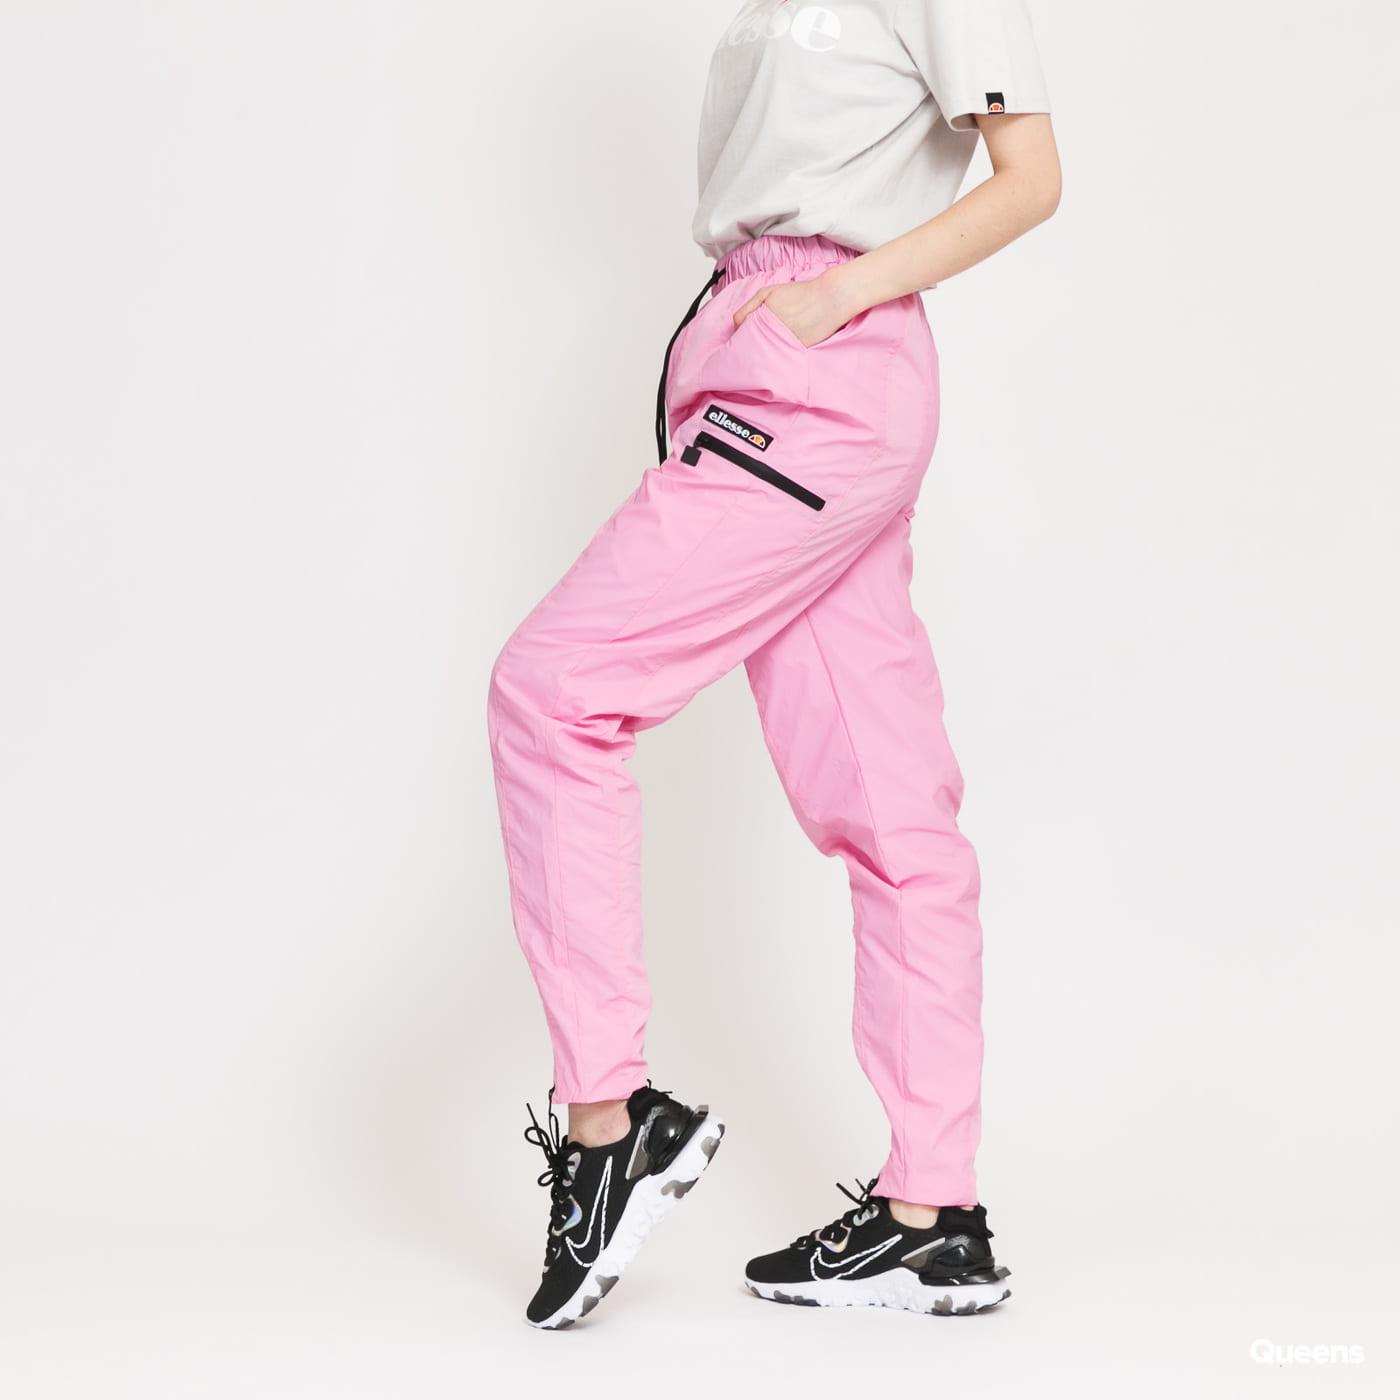 ellesse Eques Track Pant růžové